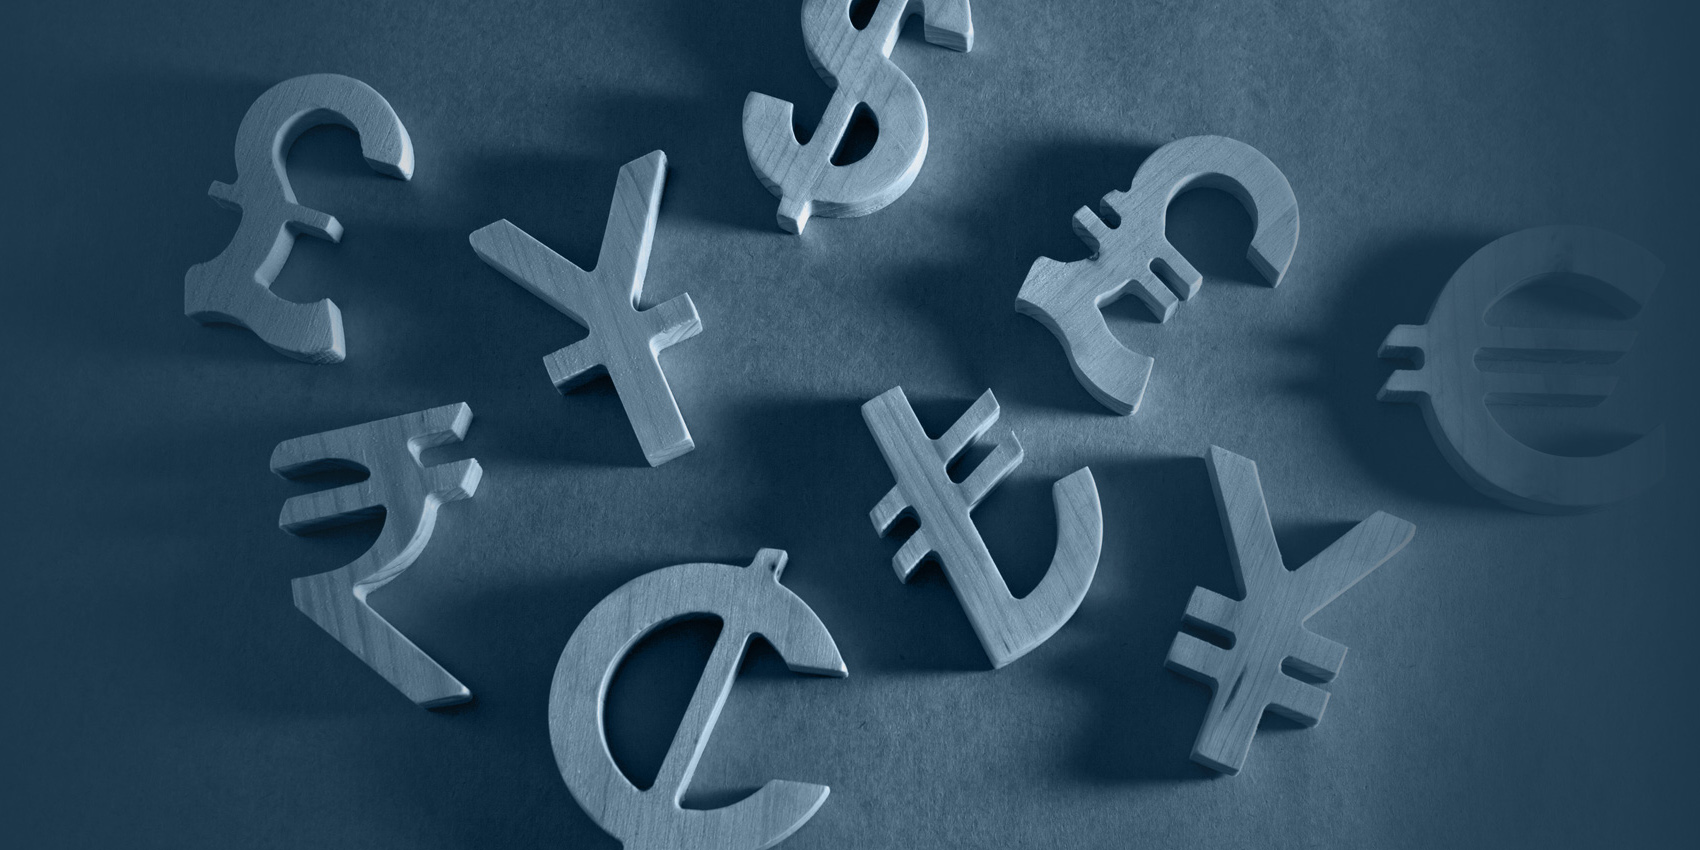 Блог им. Demetry: Курс валют некоторых MMO